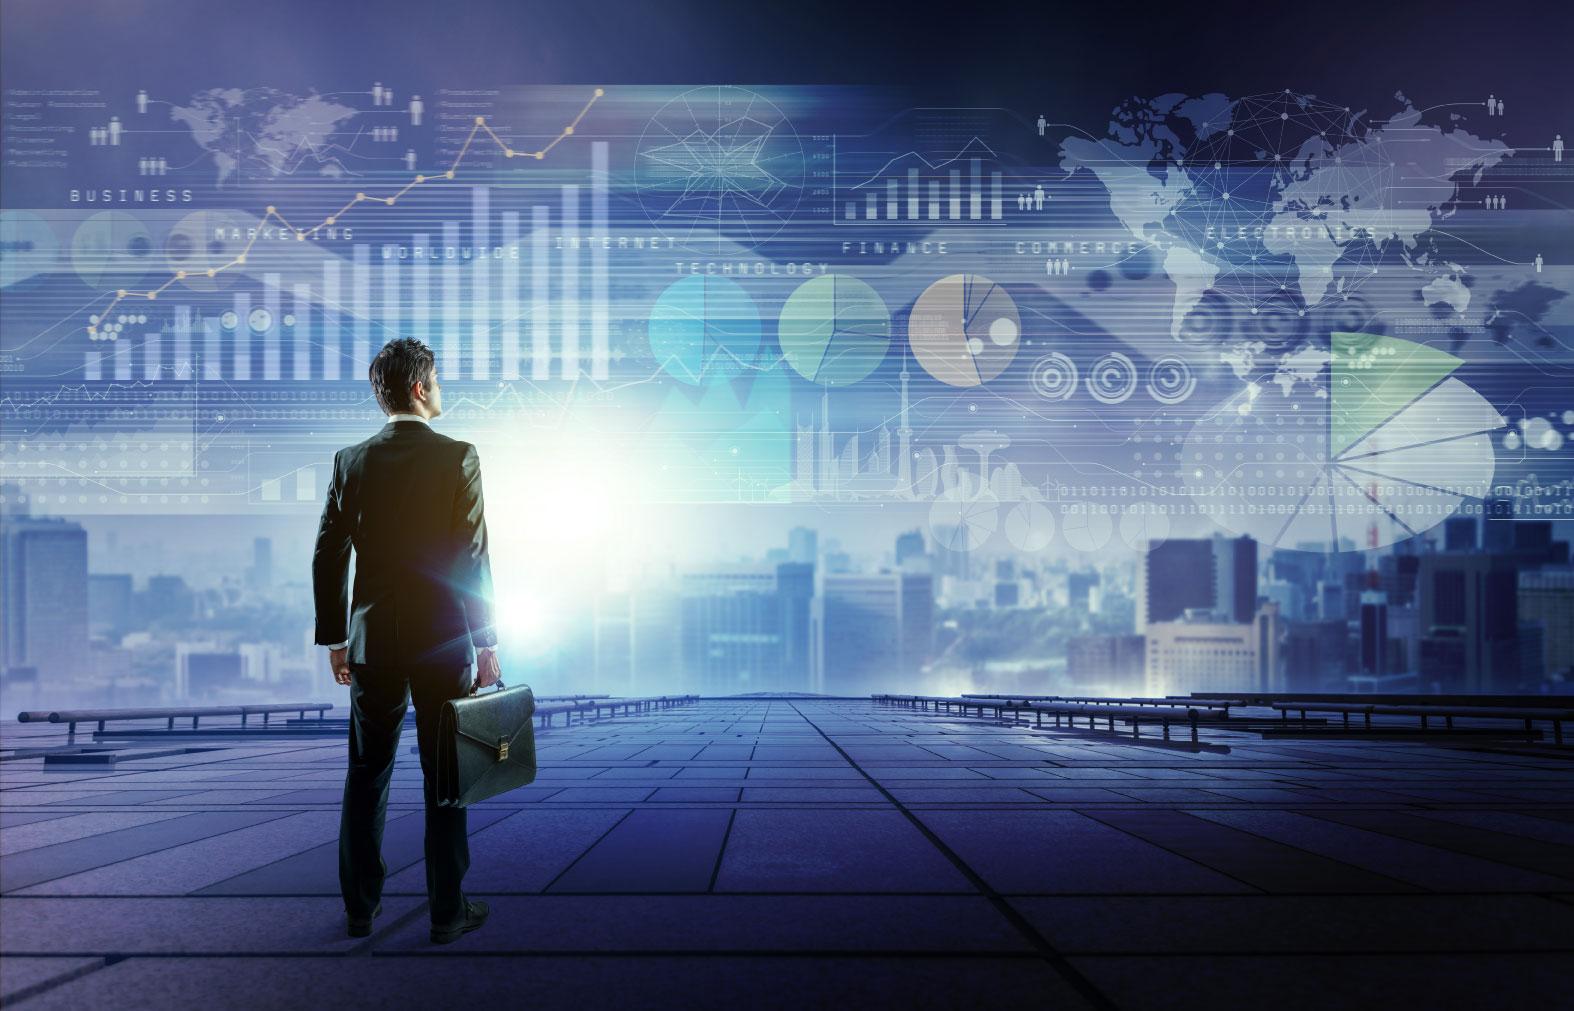 Dos tercios de las empresas no están preparadas para afrontar un ciberataque